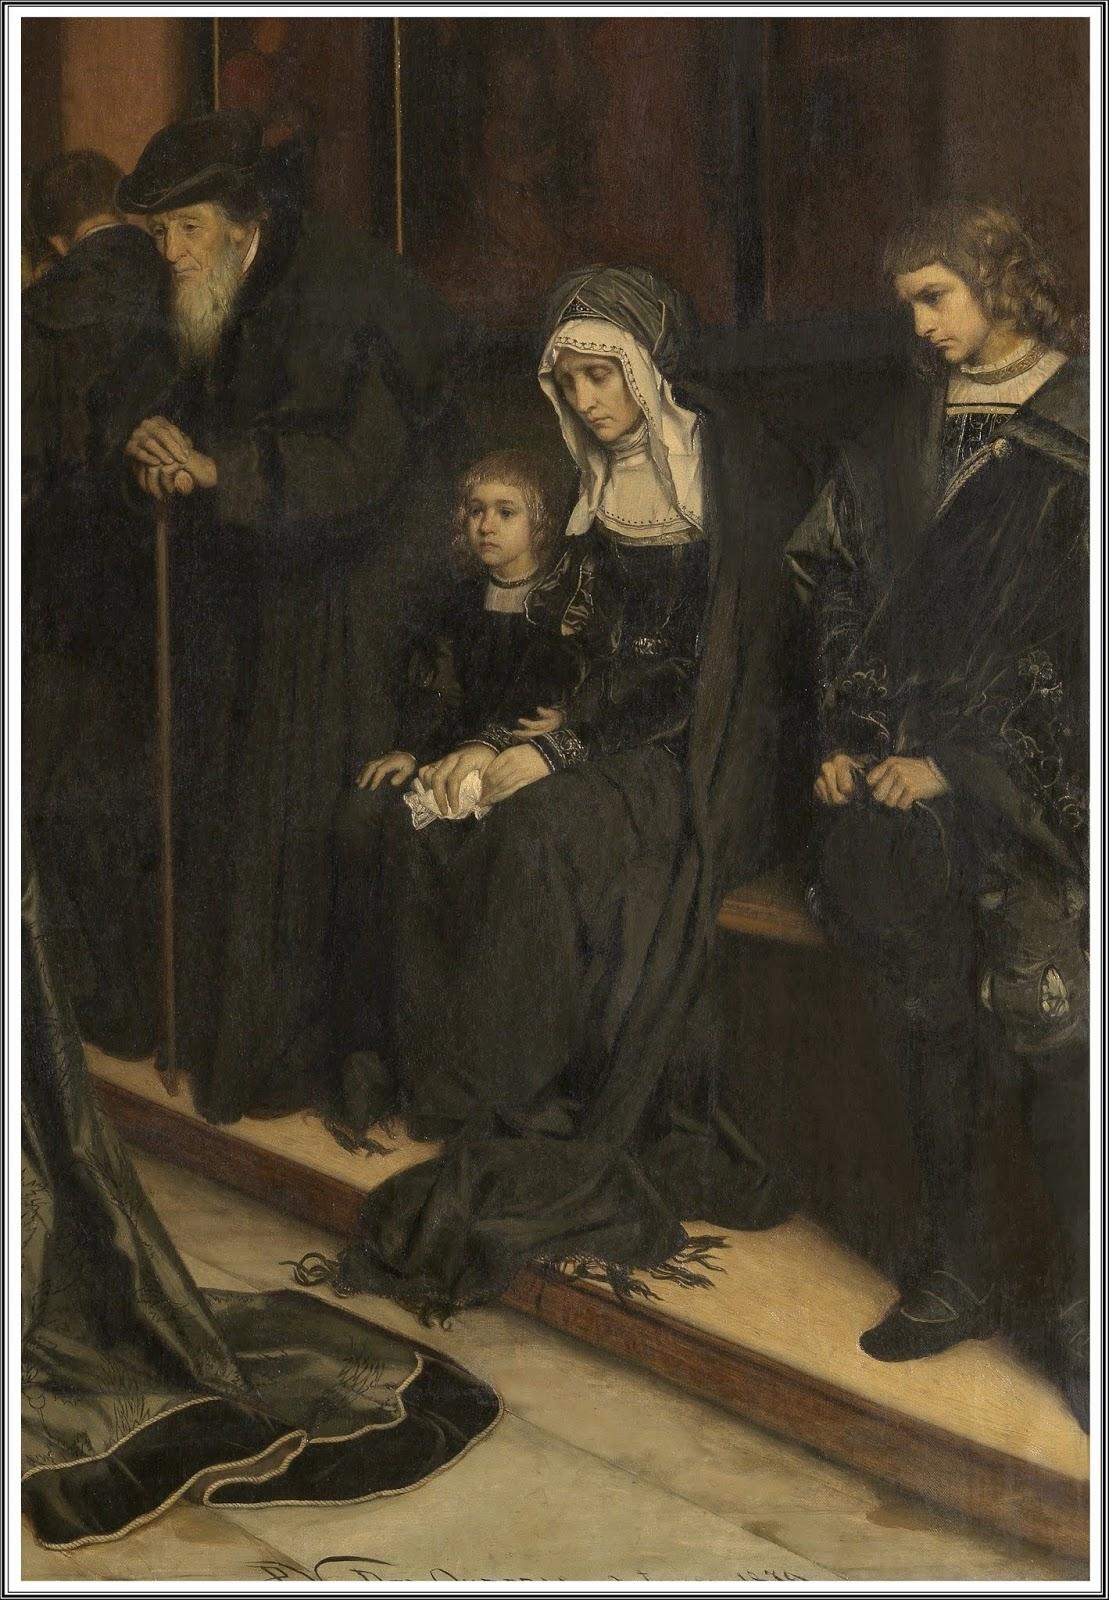 Le Prince Lointain Pierre Jan Van Der Ouderaa 1841 1915 Le